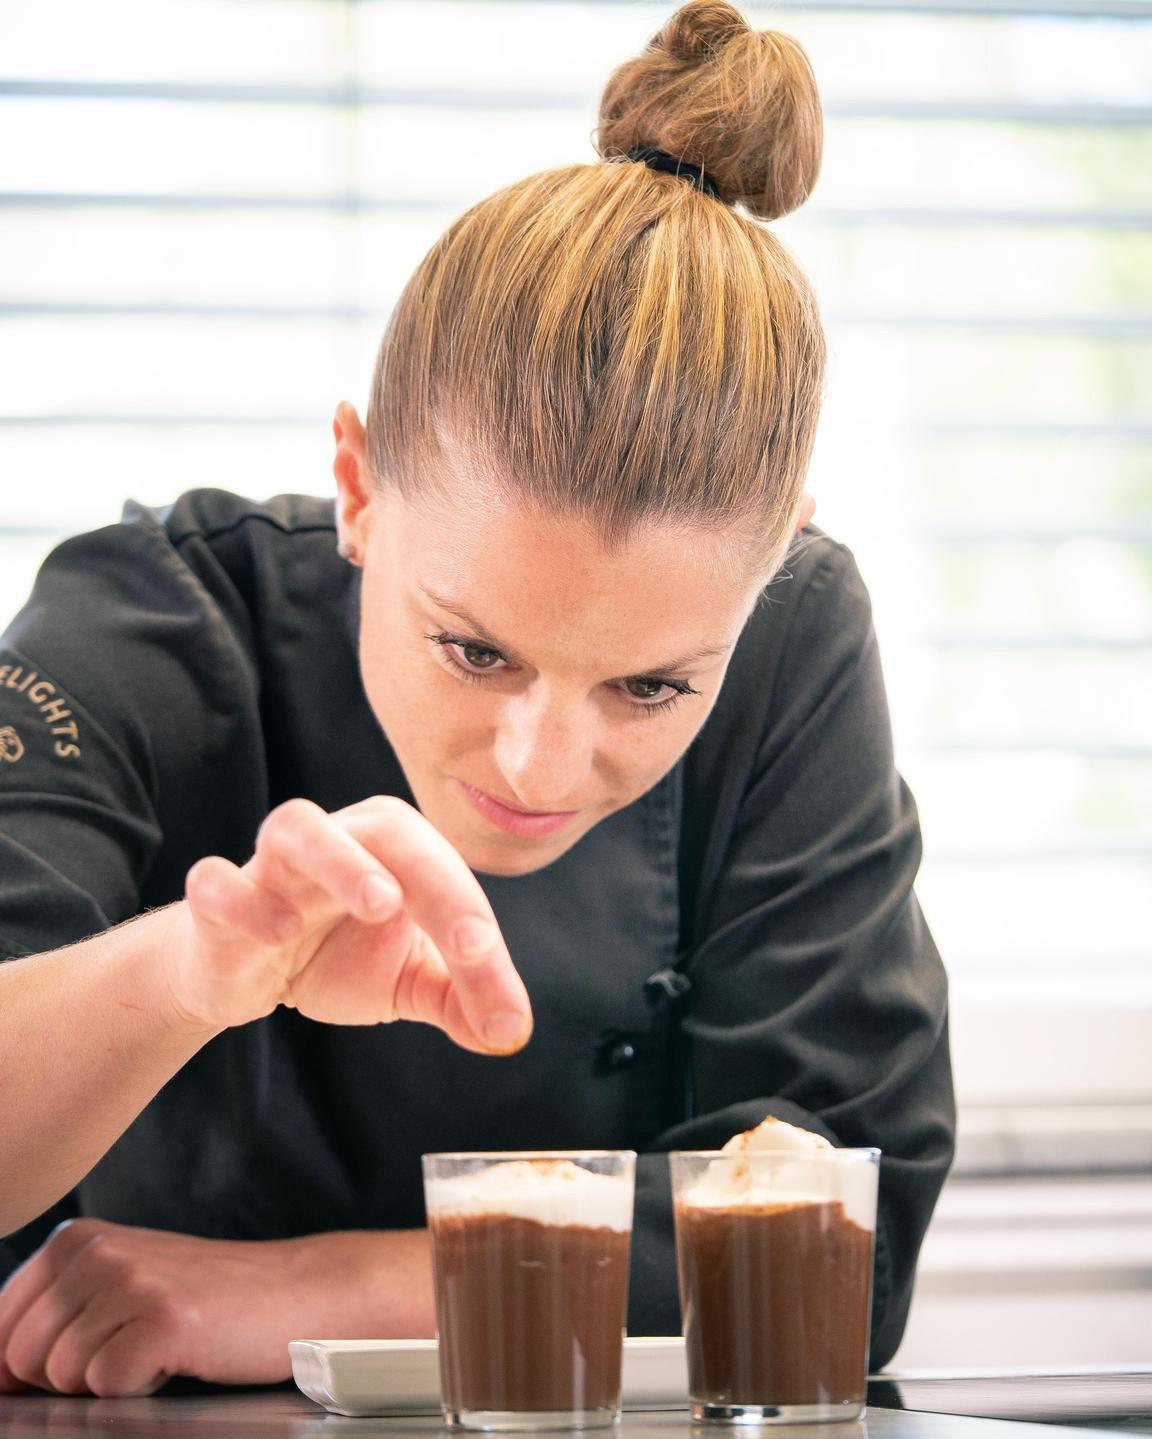 vegan chocolate dessert made on a free veecoco online vegan cooking courses